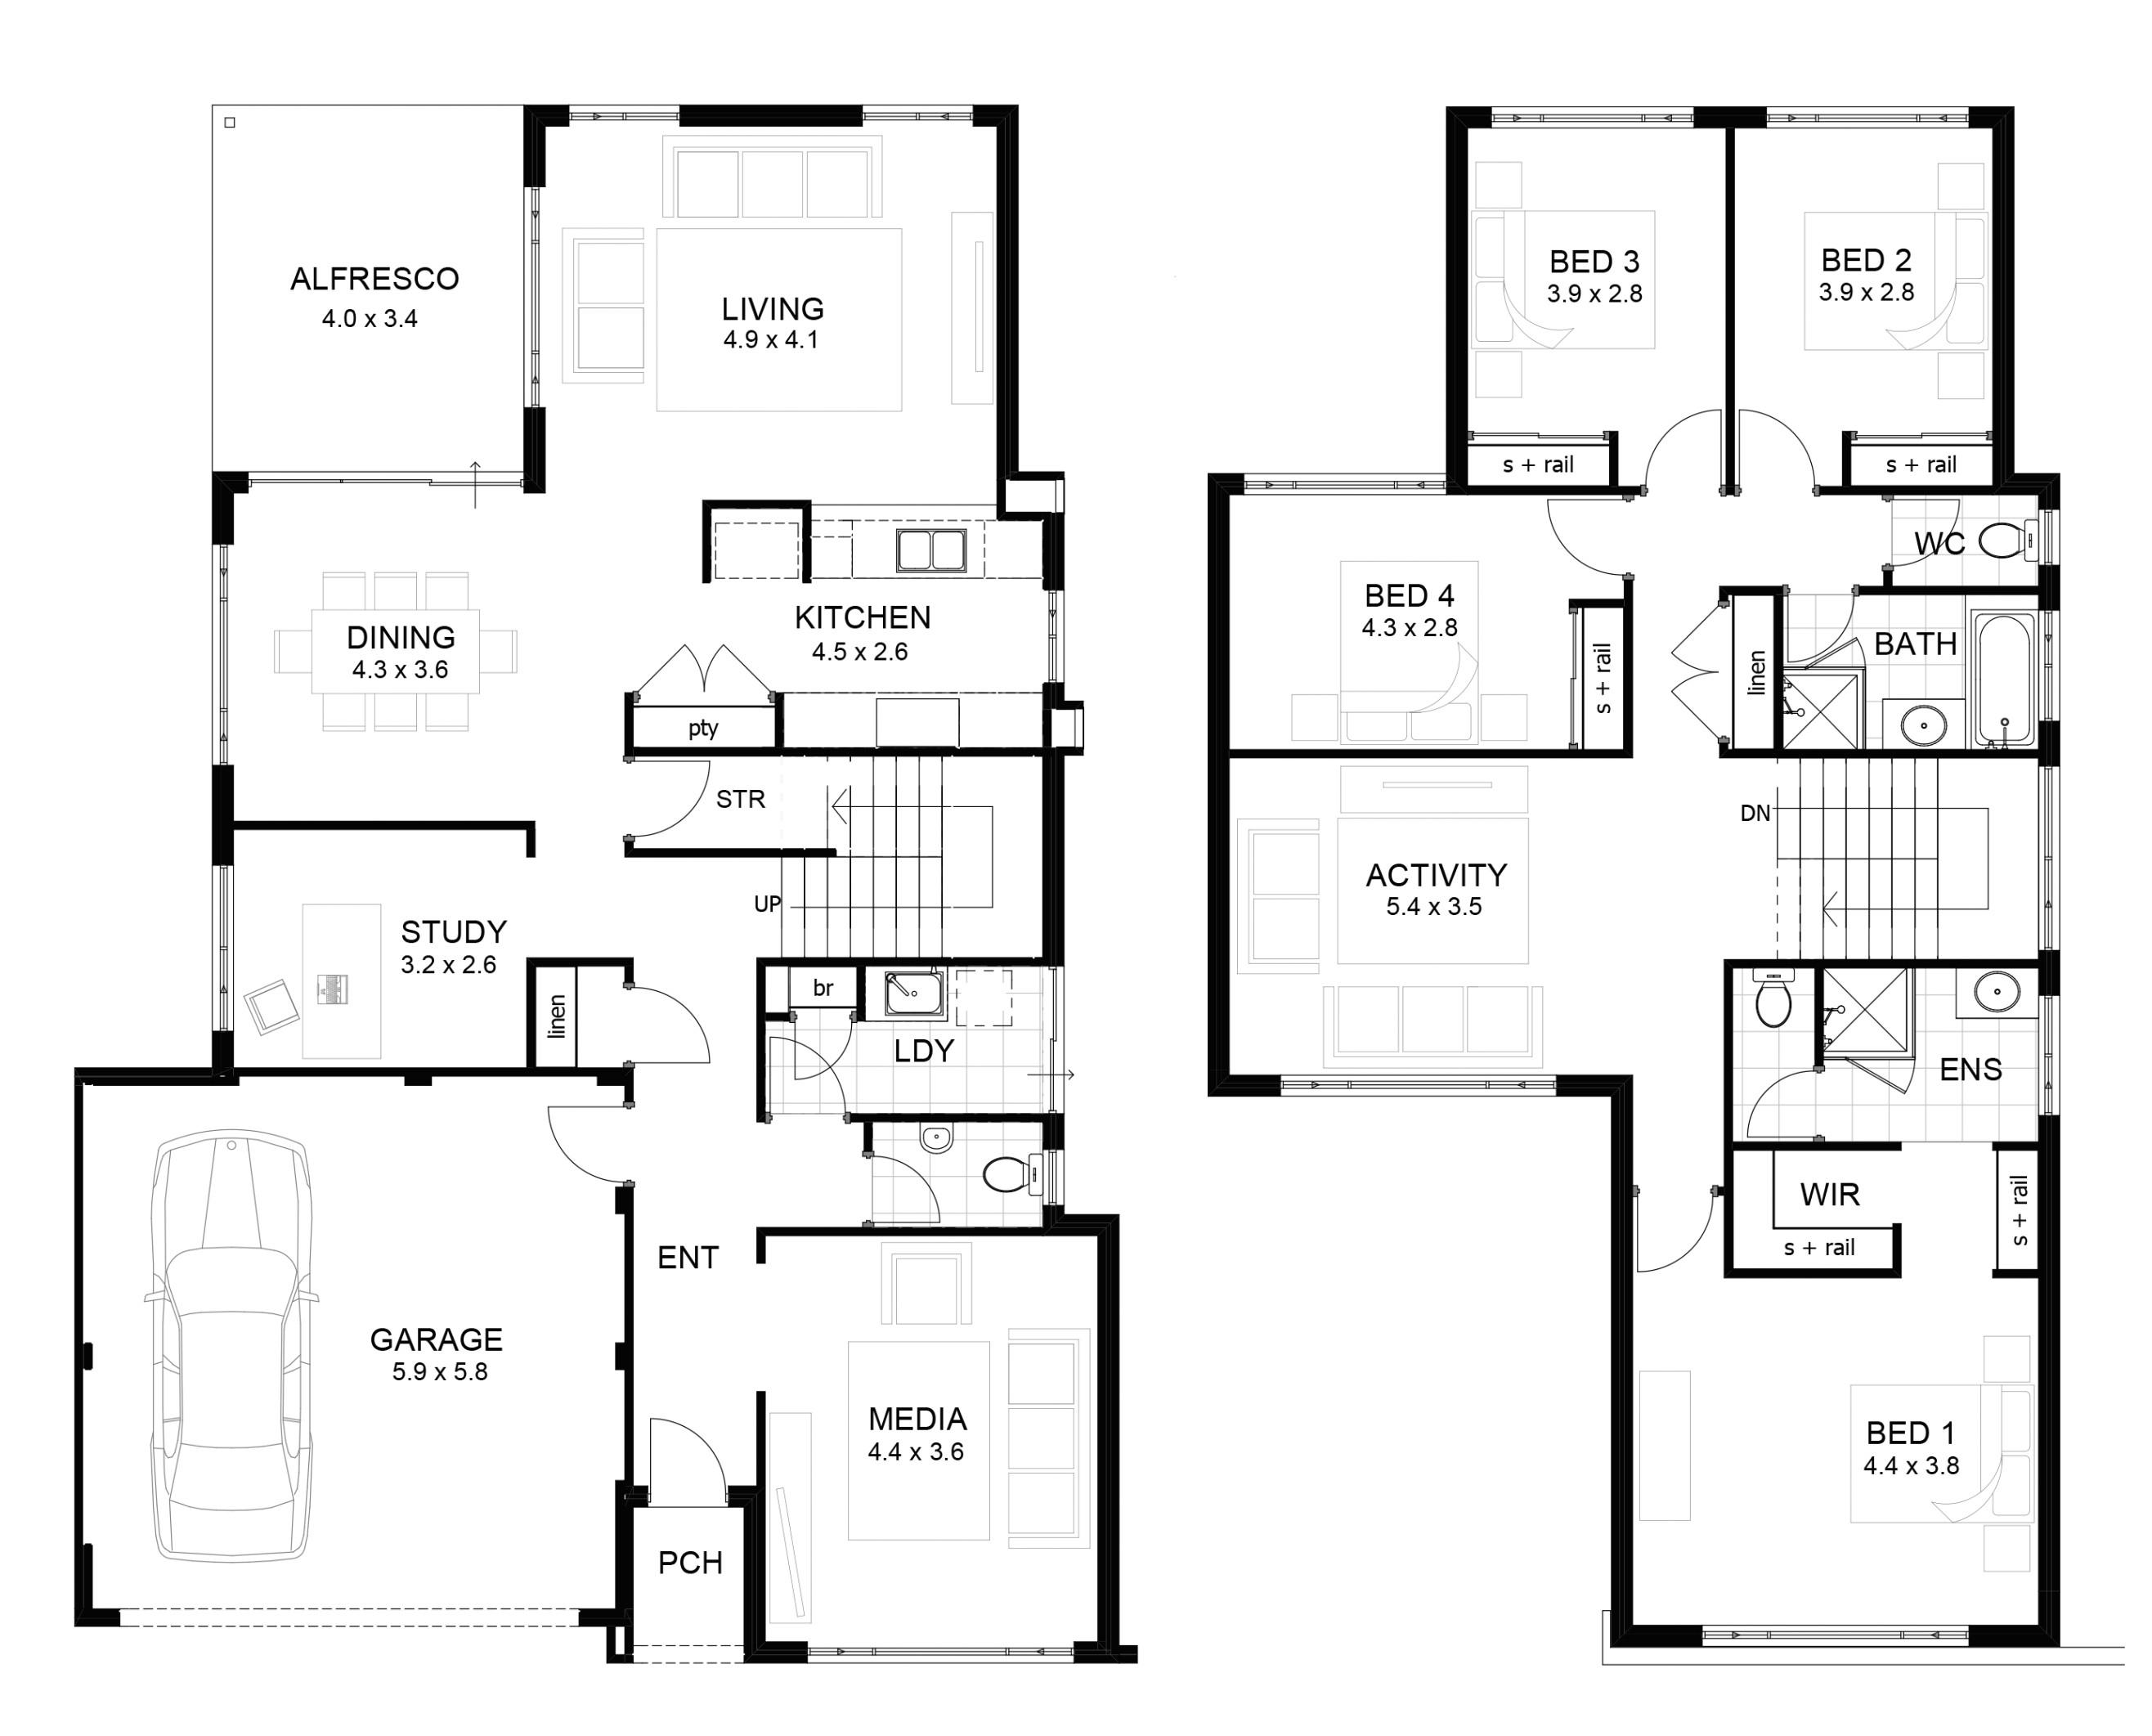 luxury 2 story home floor plans